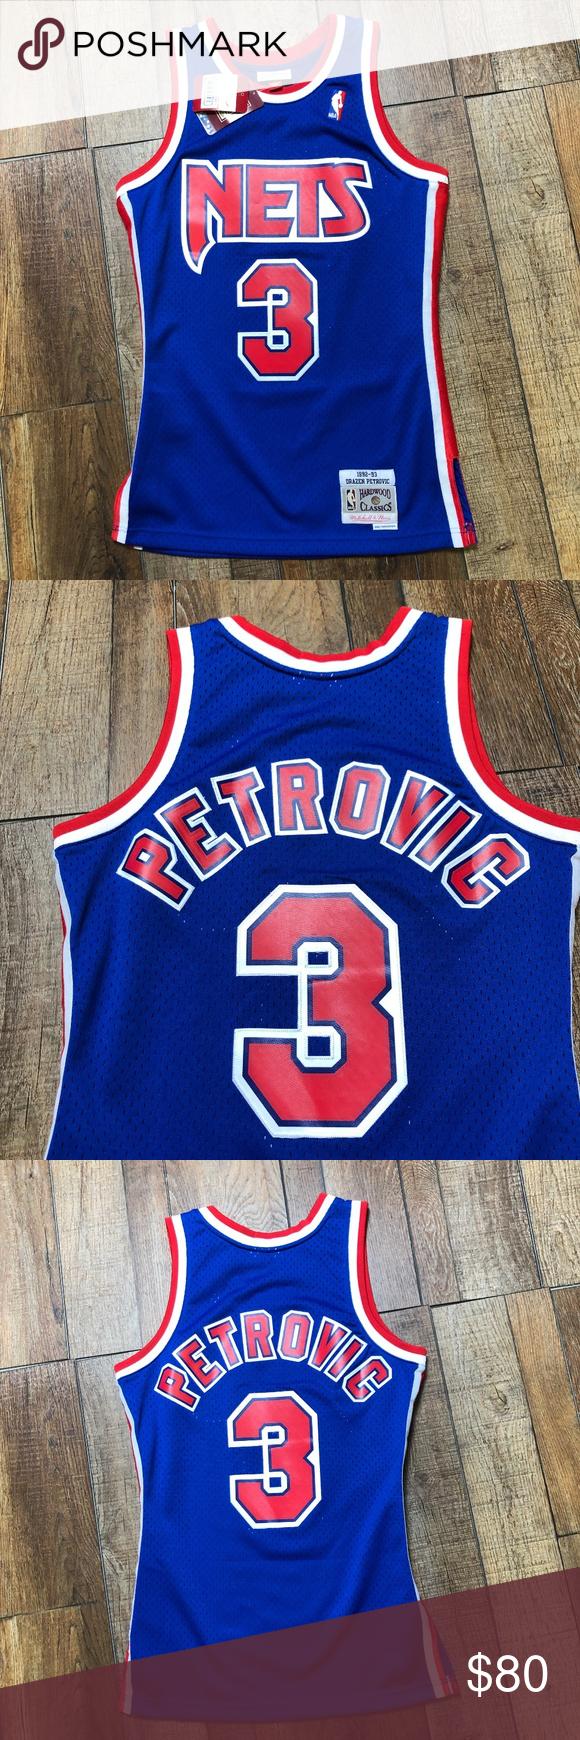 NWT Drazen Petrovic New Jersey Nets NBA Jersey NEW Brand New